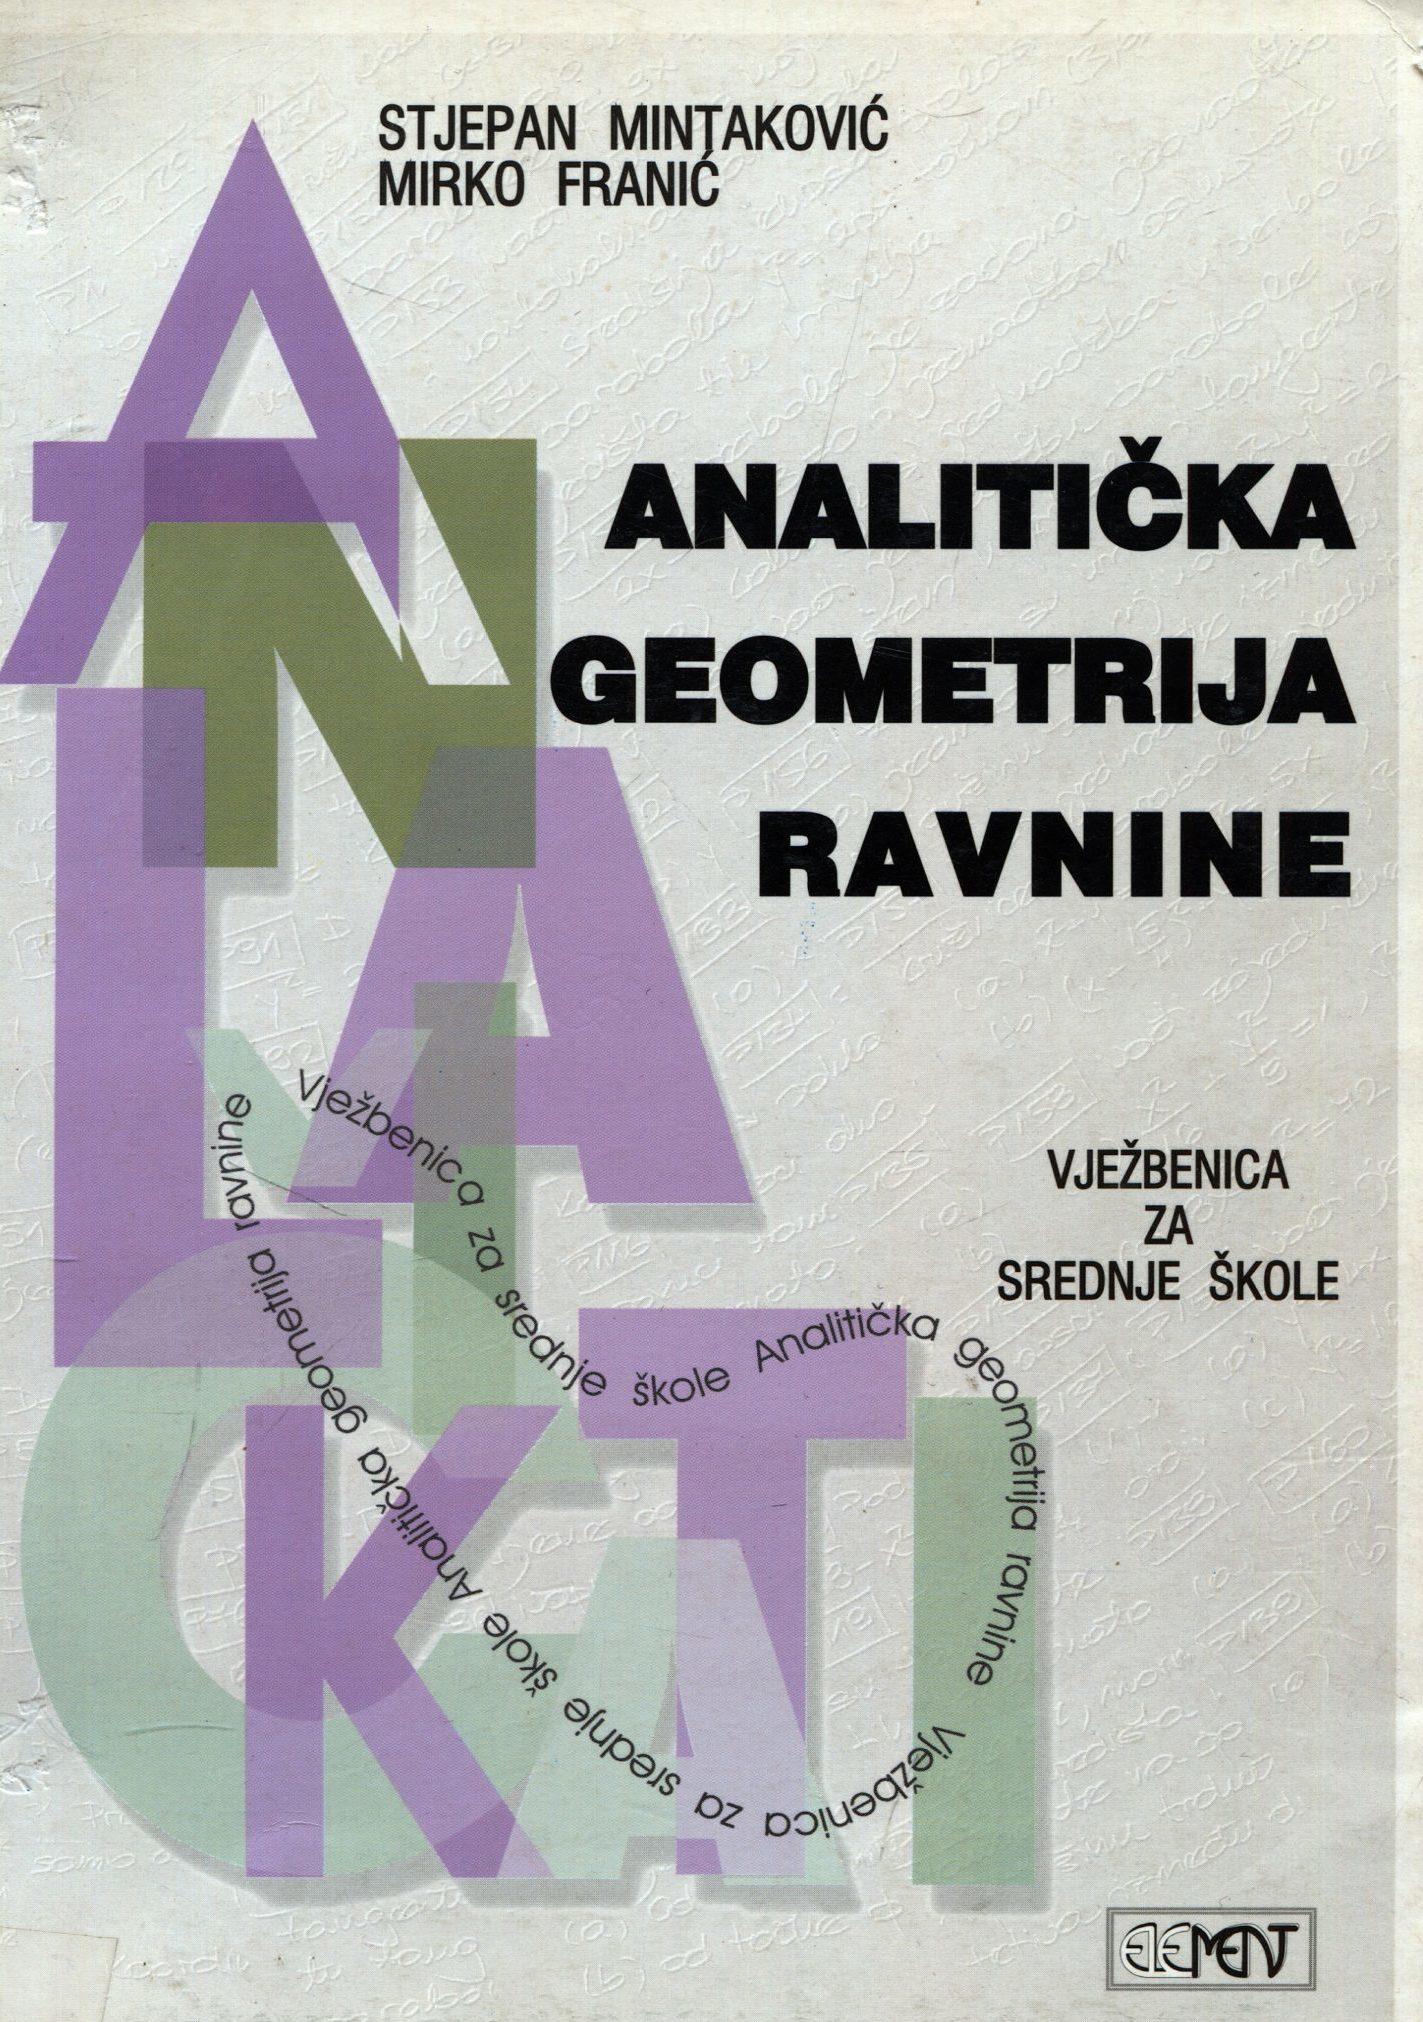 Analitička geometrija ravnine Stjepan Mintaković, Mirko Franić